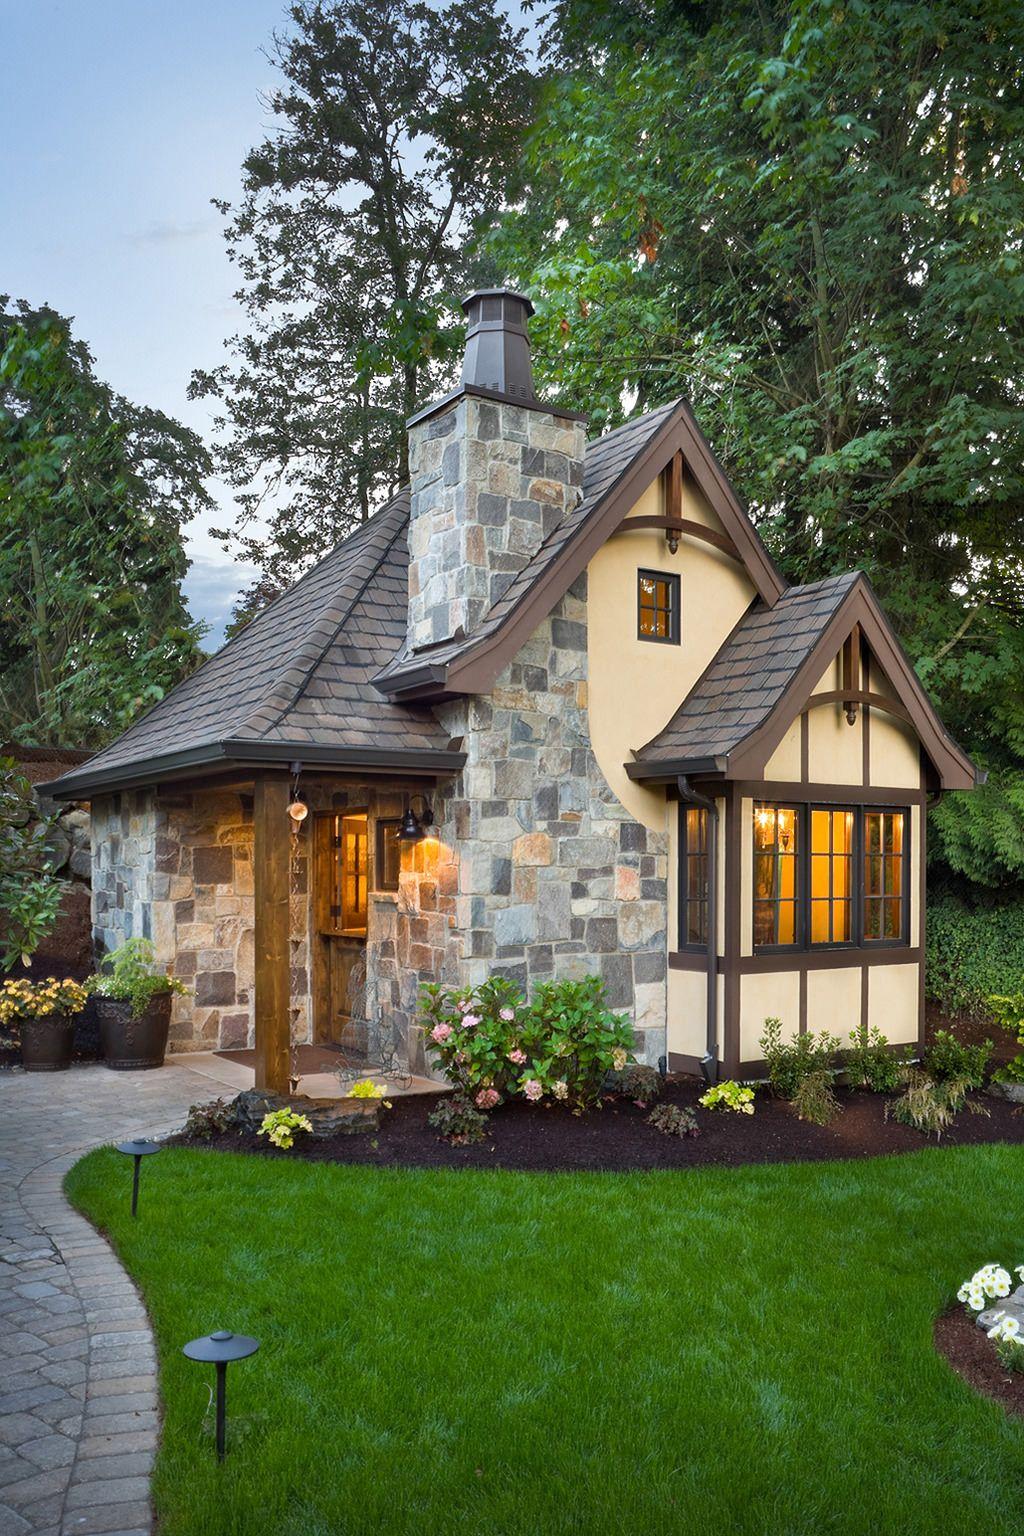 21 Diy Tiny House Plans Blueprints Cottage House Designs Cottage House Plans Beautiful Small Homes